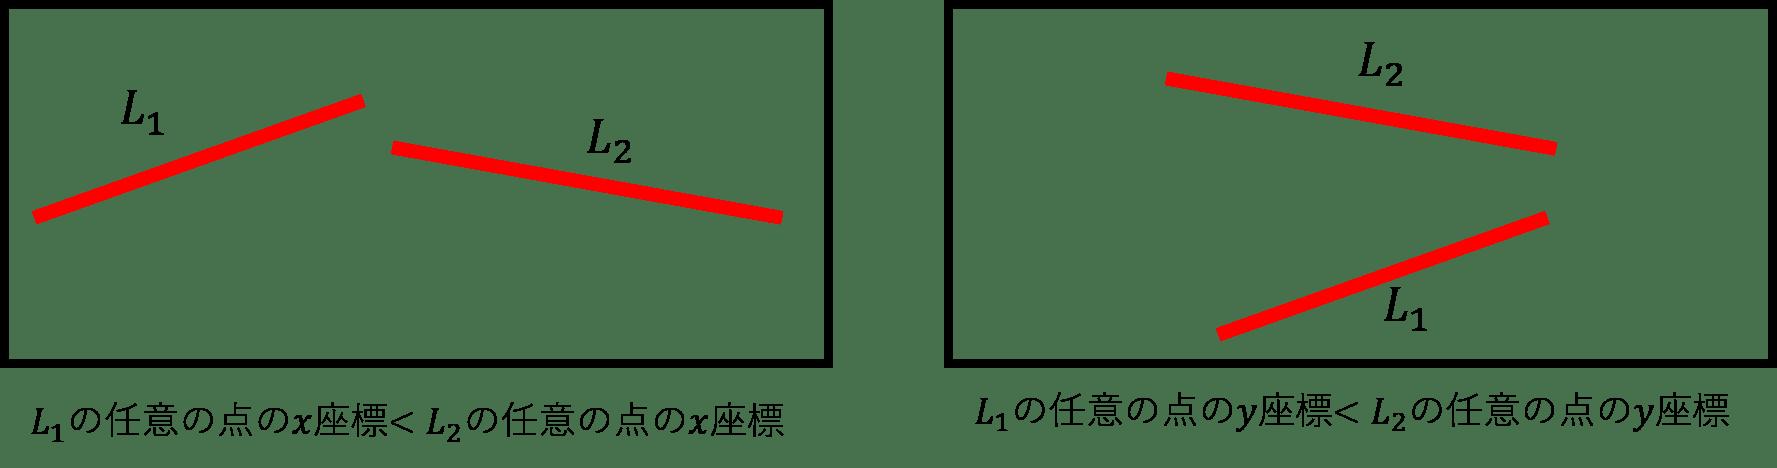 線分同士の交差判定例01.png